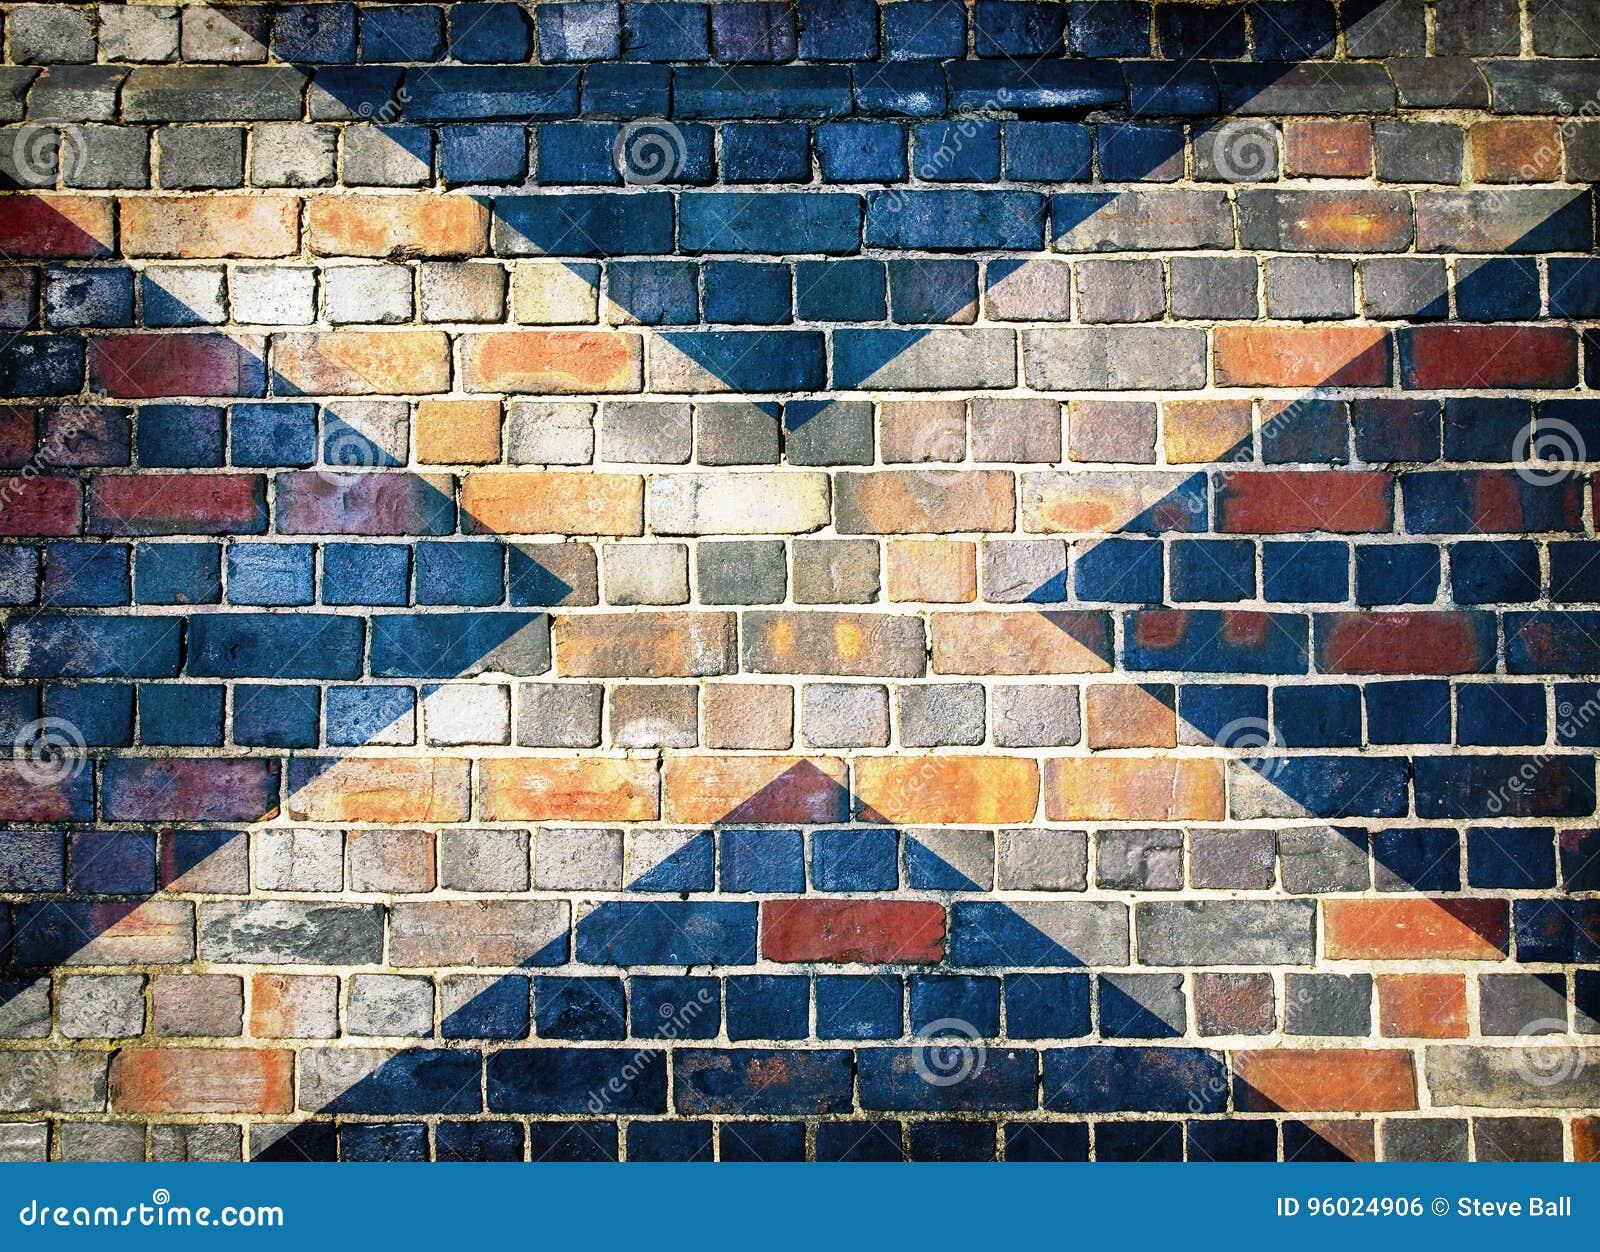 Scotland flag on a brick wall background